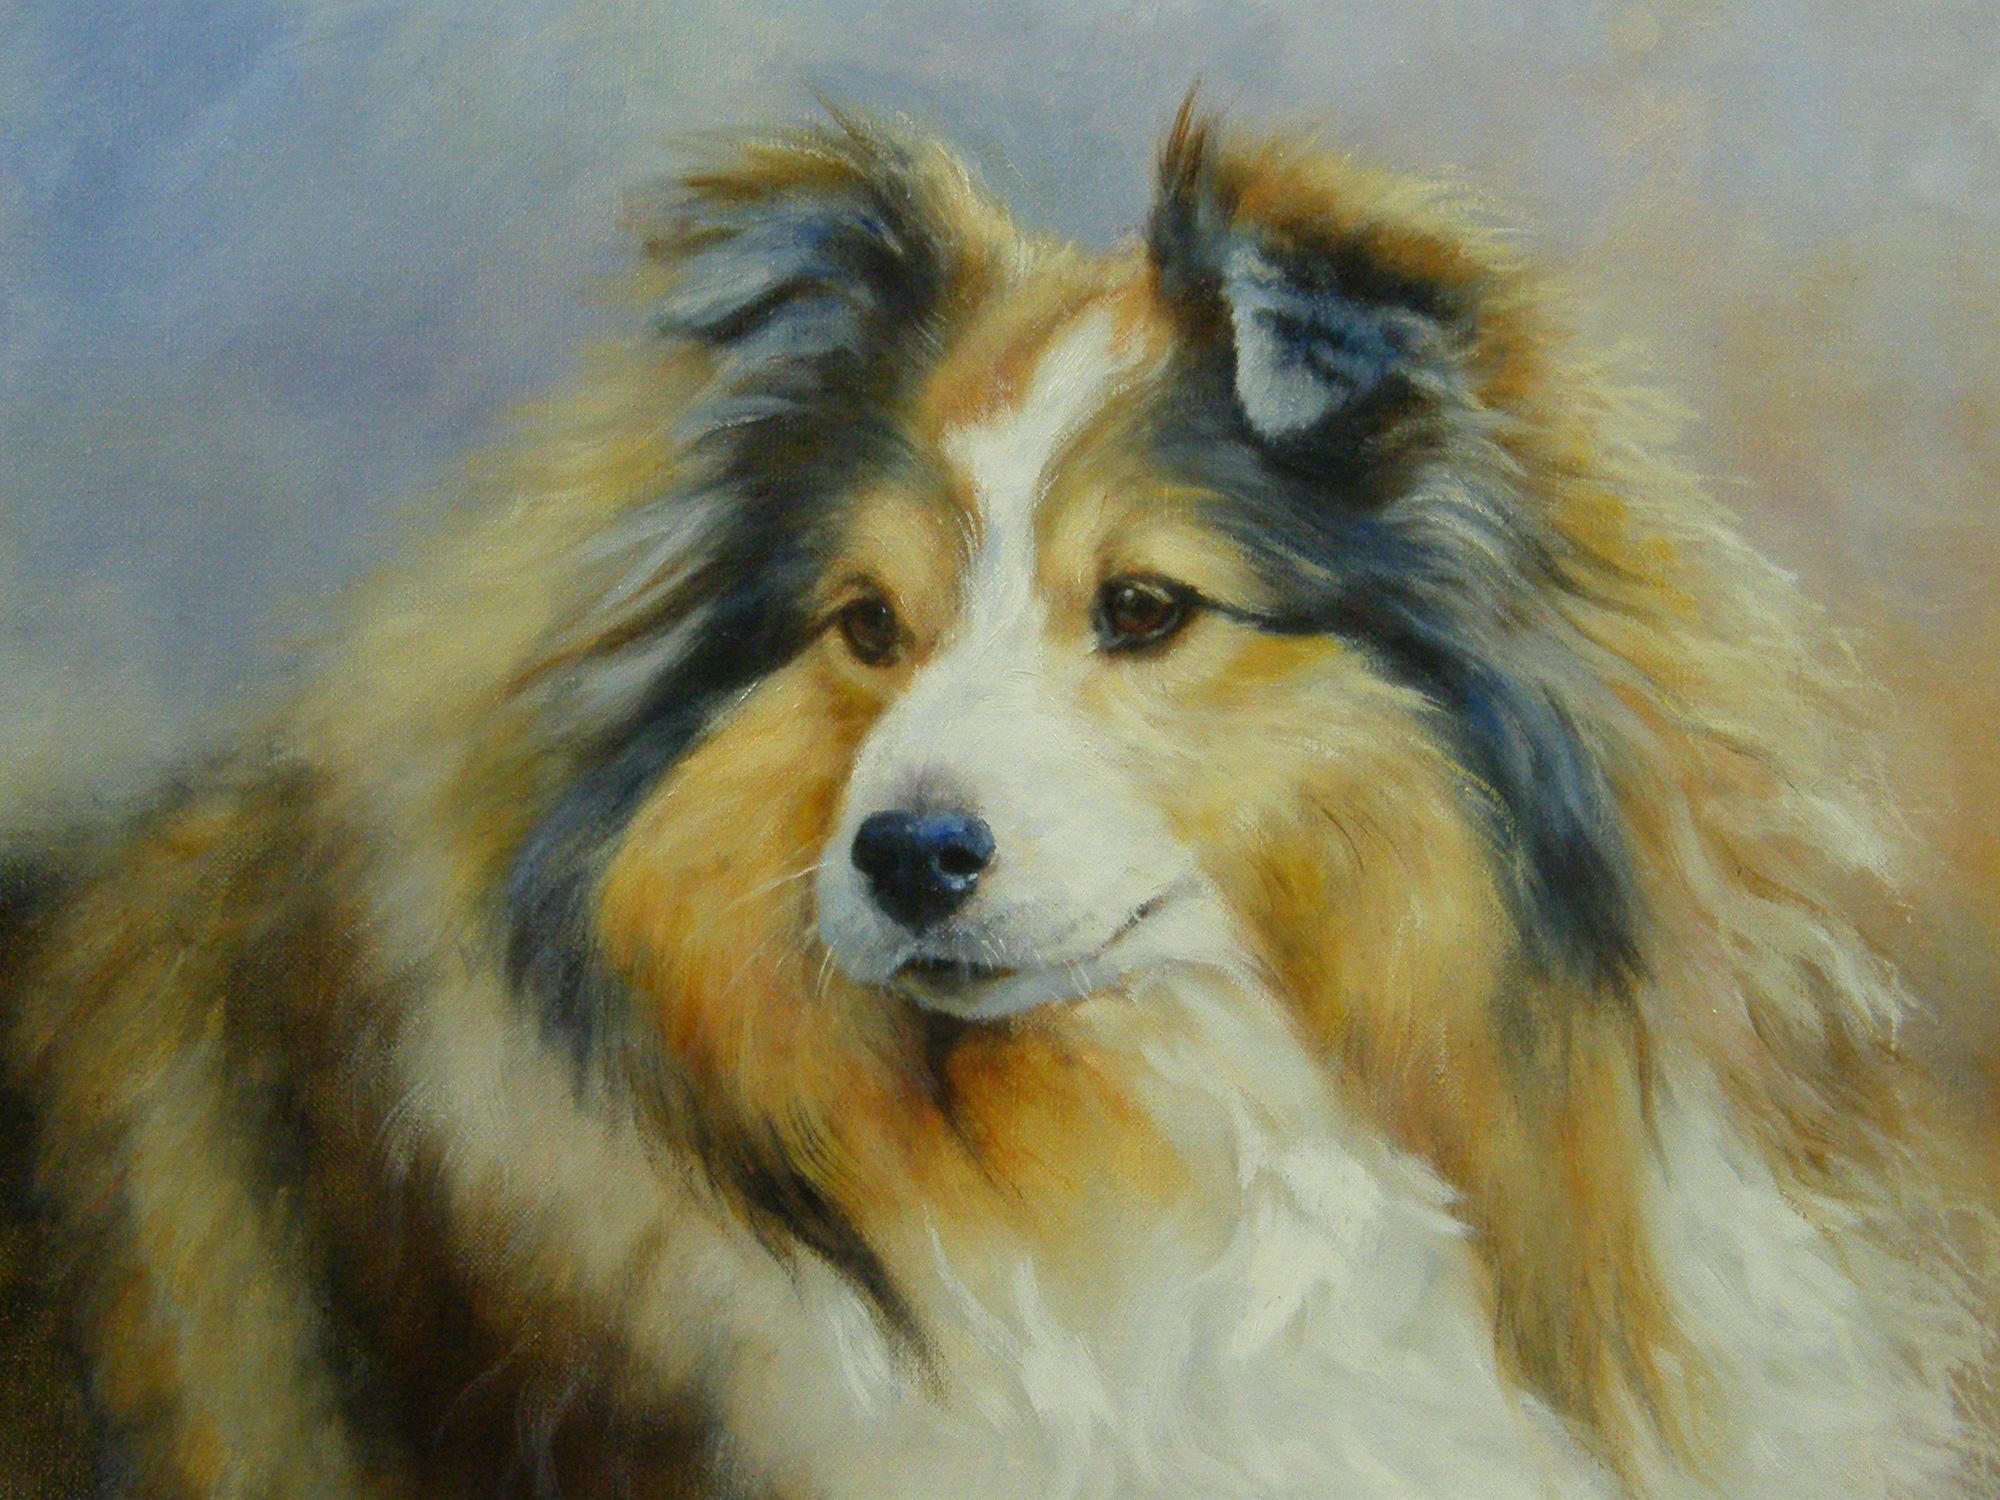 dawn-russell-pet-portraits-at-yardley-arts-1.jpg